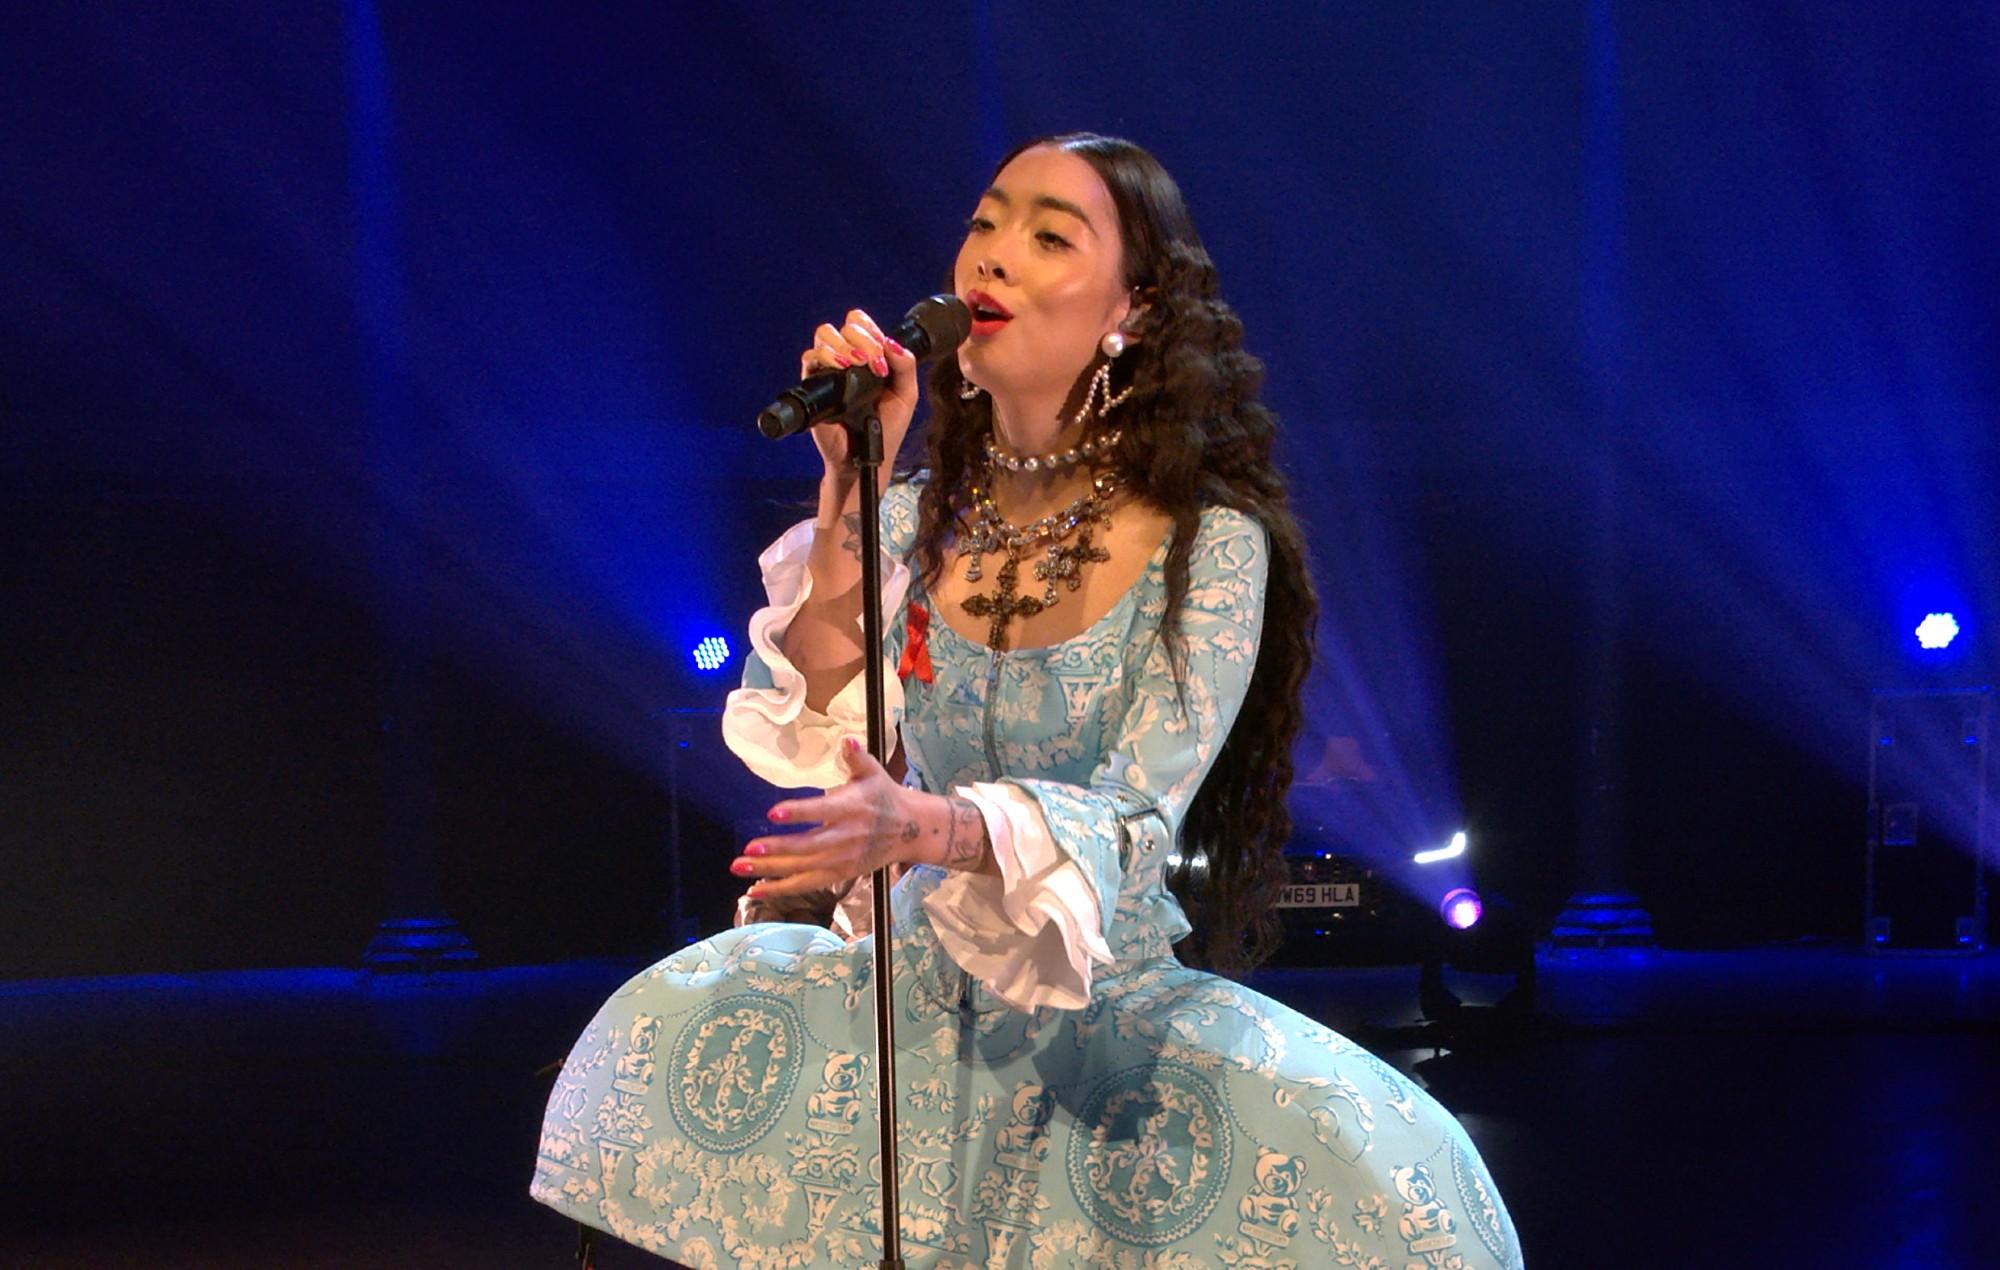 Rina Sawayama says she's already begun work on second album